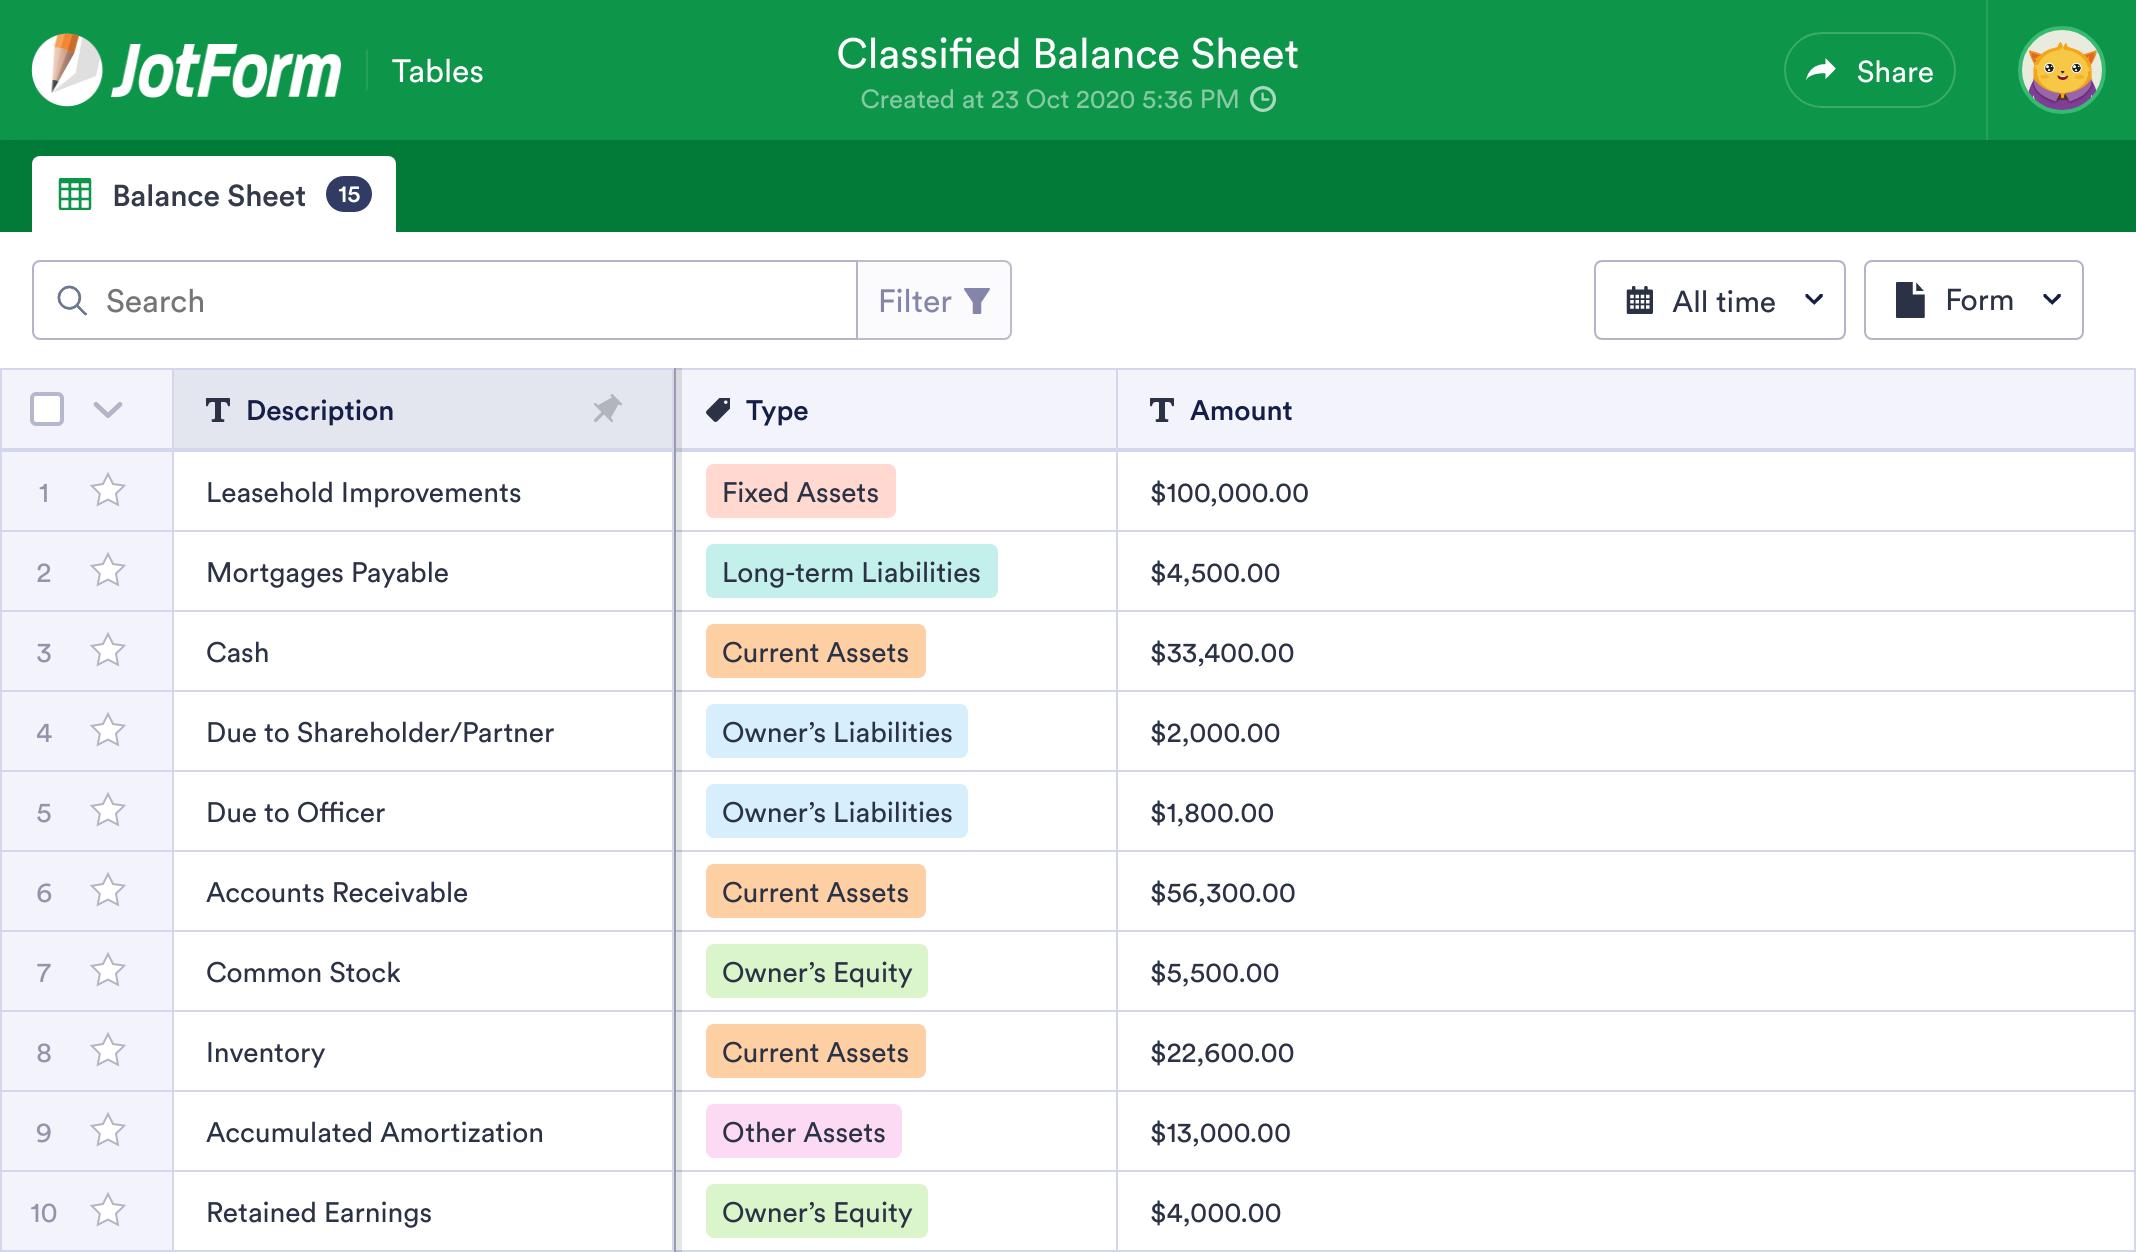 Classified Balance Sheet